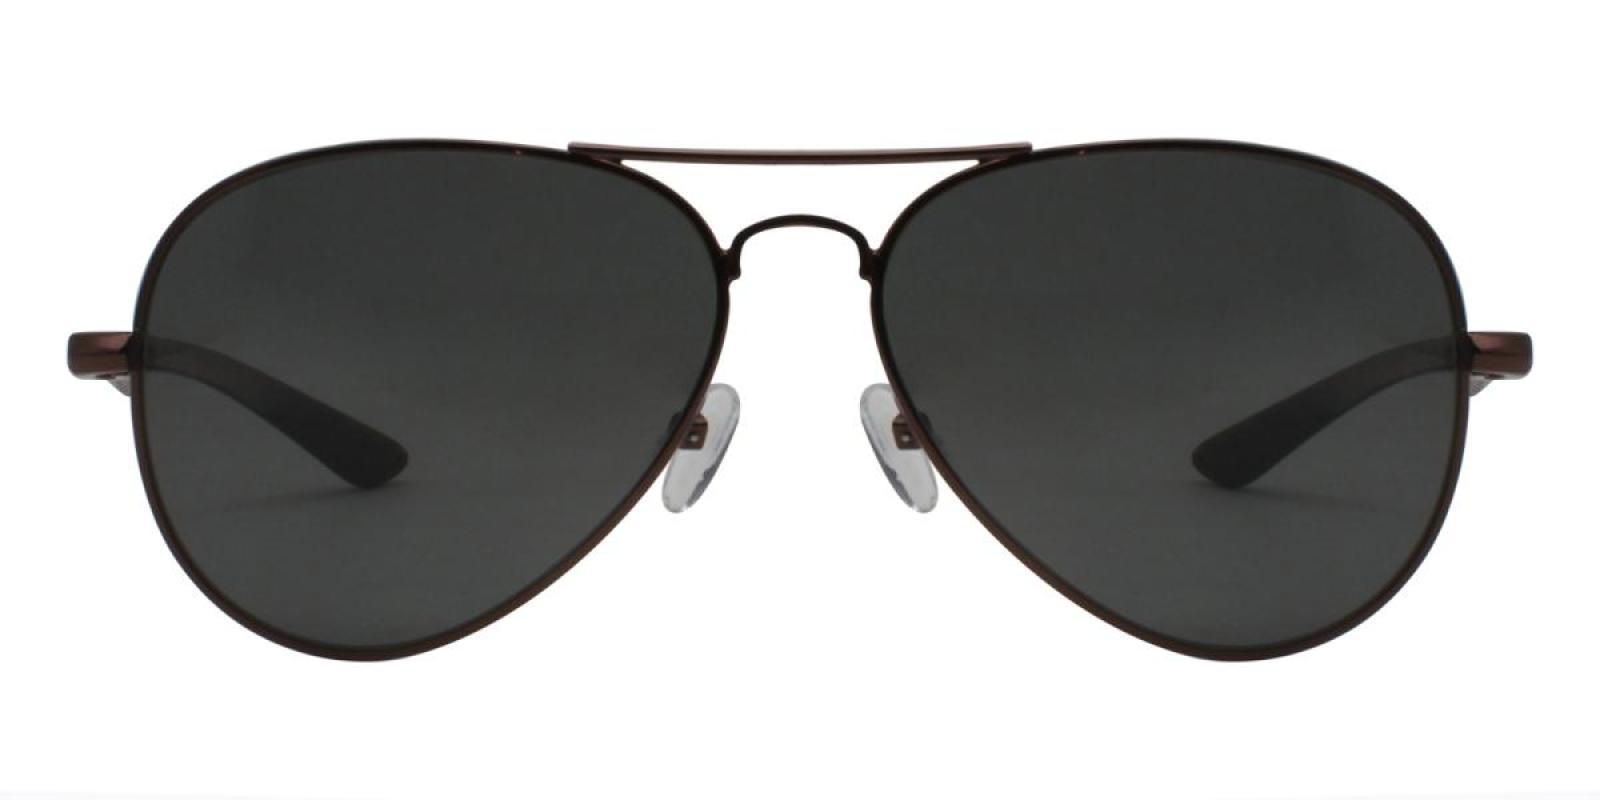 Mckain-Brown-Aviator-Metal-Sunglasses-additional2